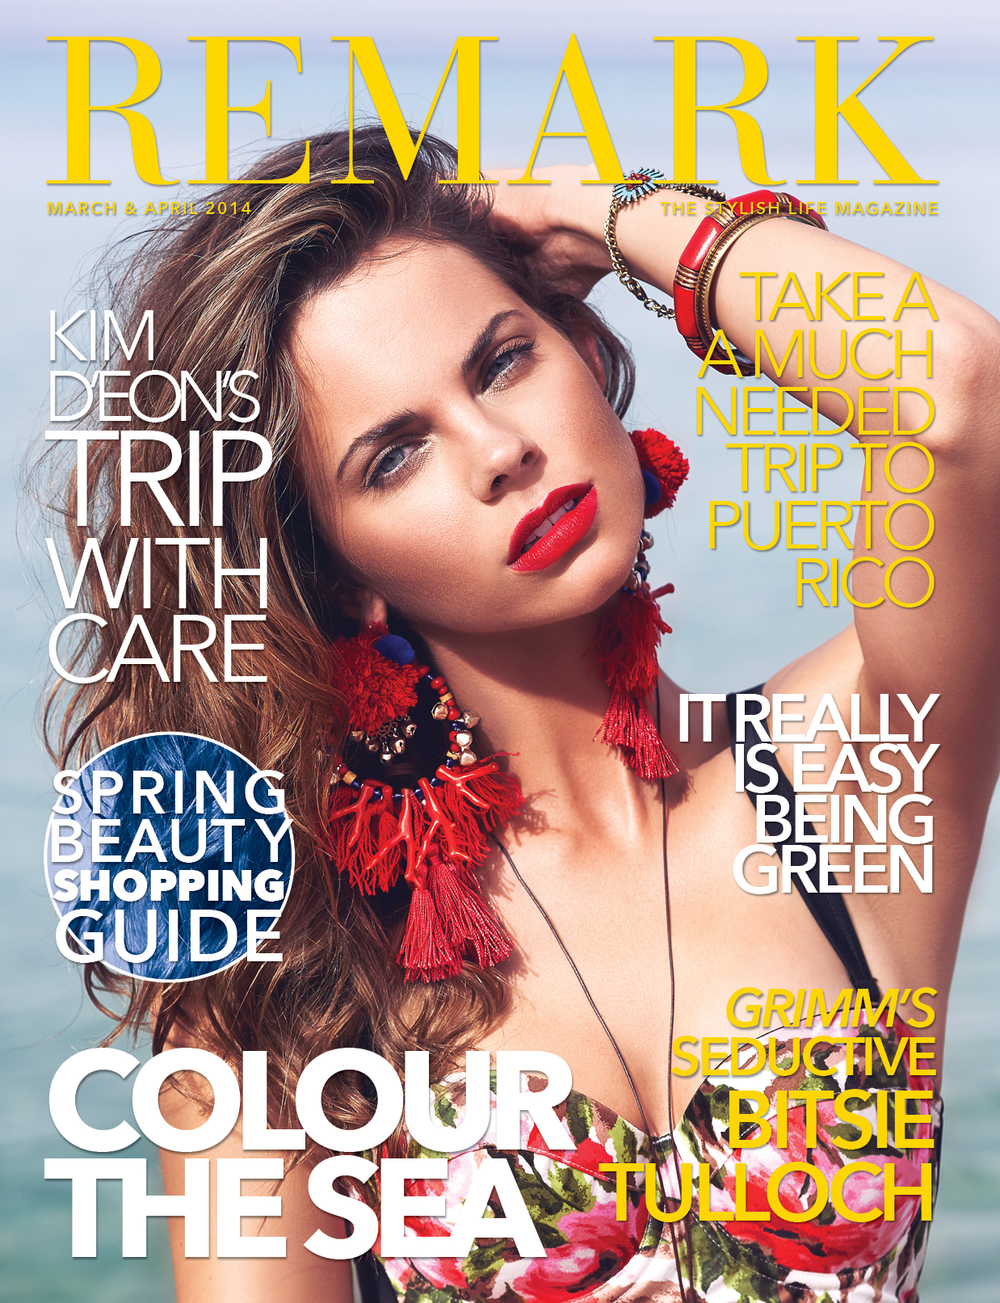 Remark Magazine March /April 2014